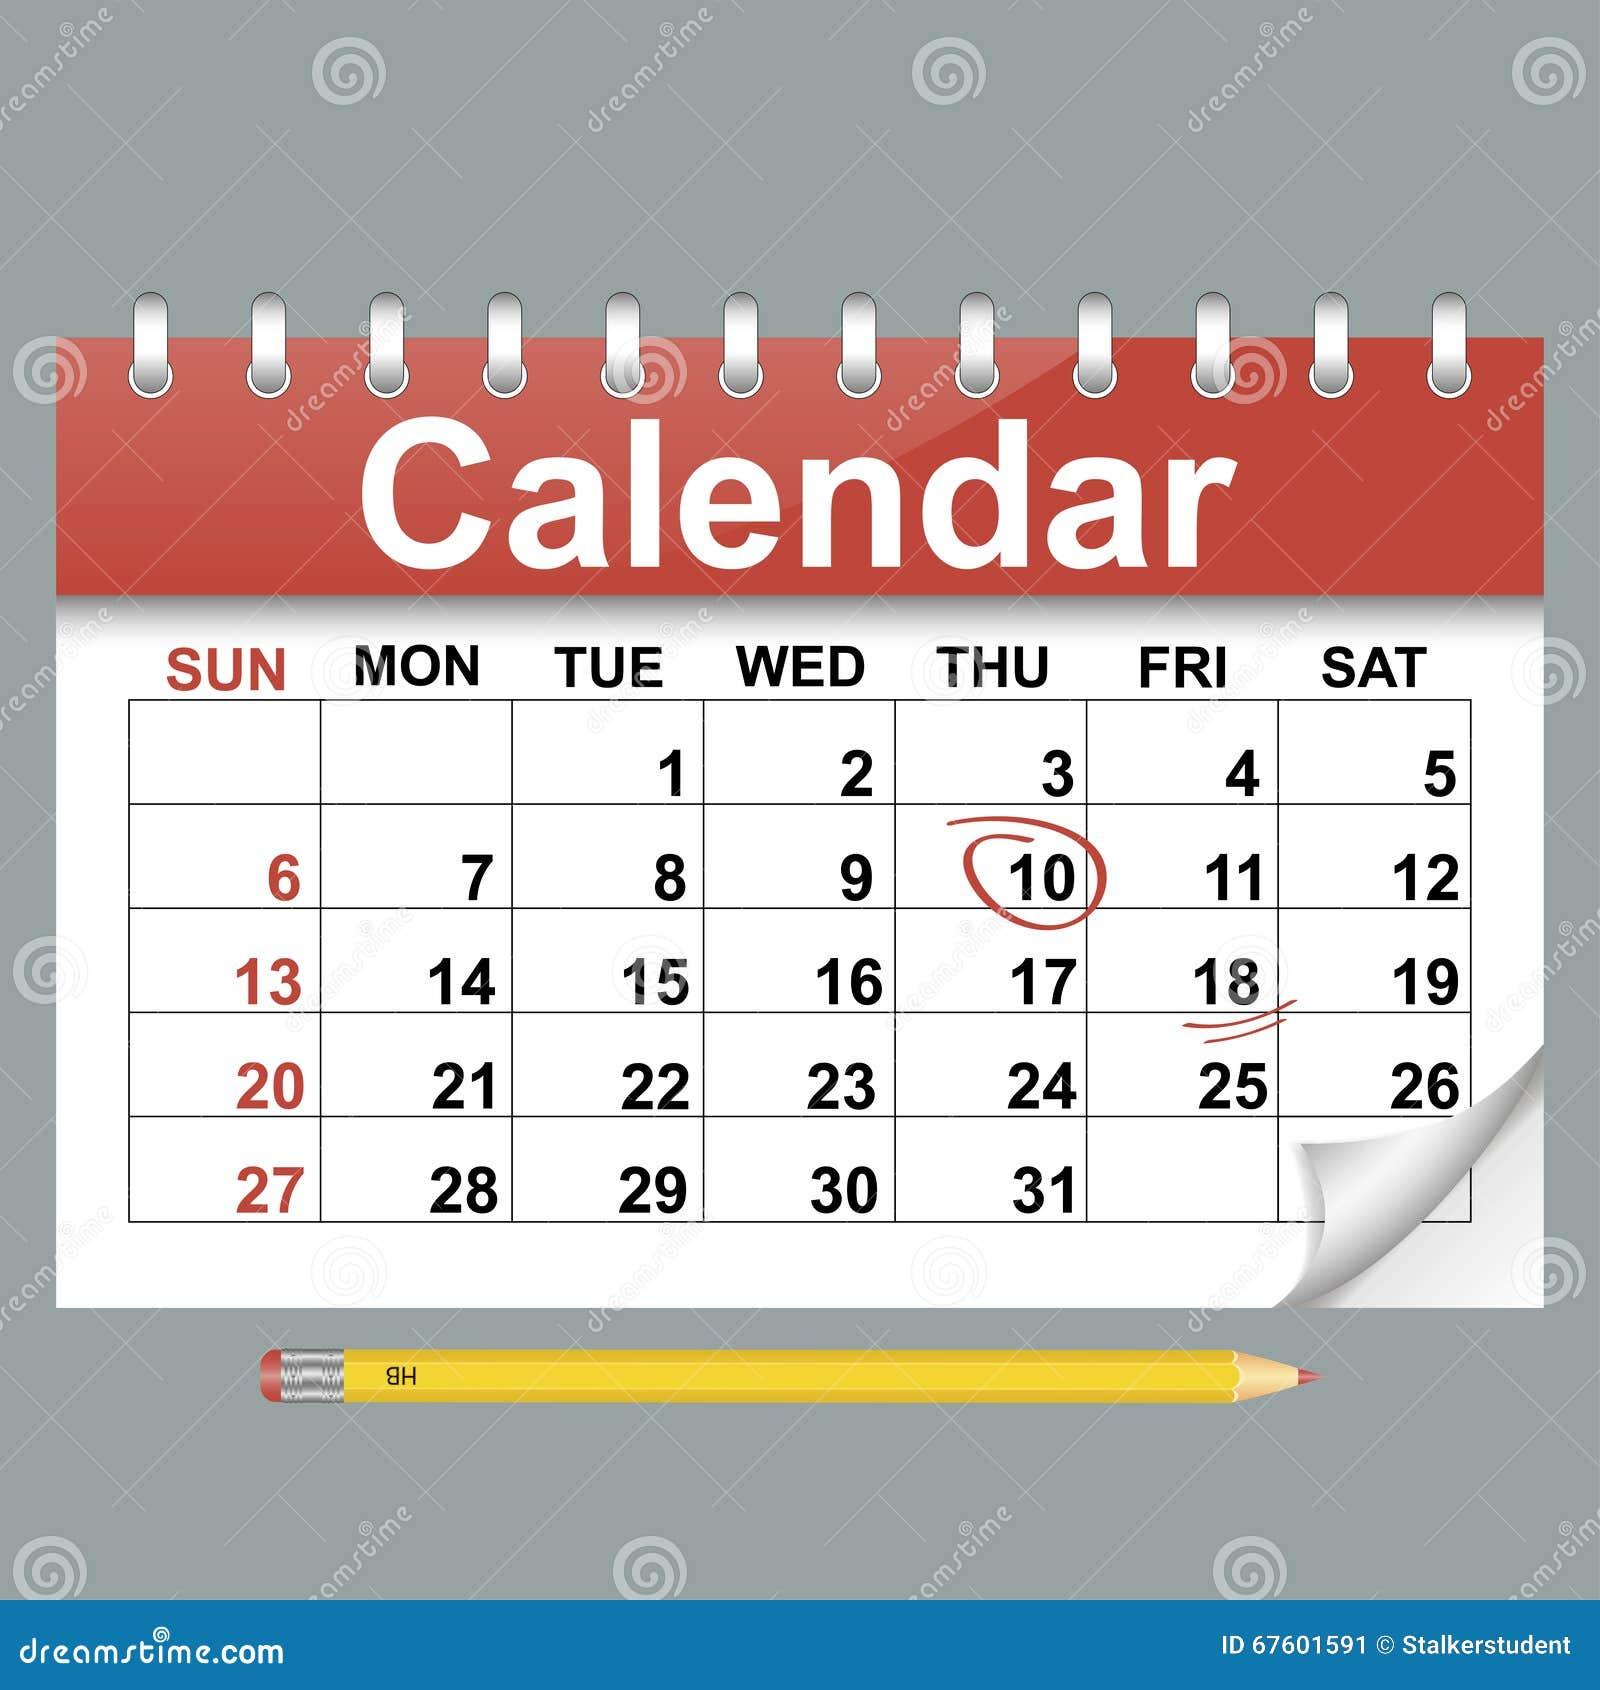 Calendar Flat Illustration : Vector illustration of calendar in flat style stock